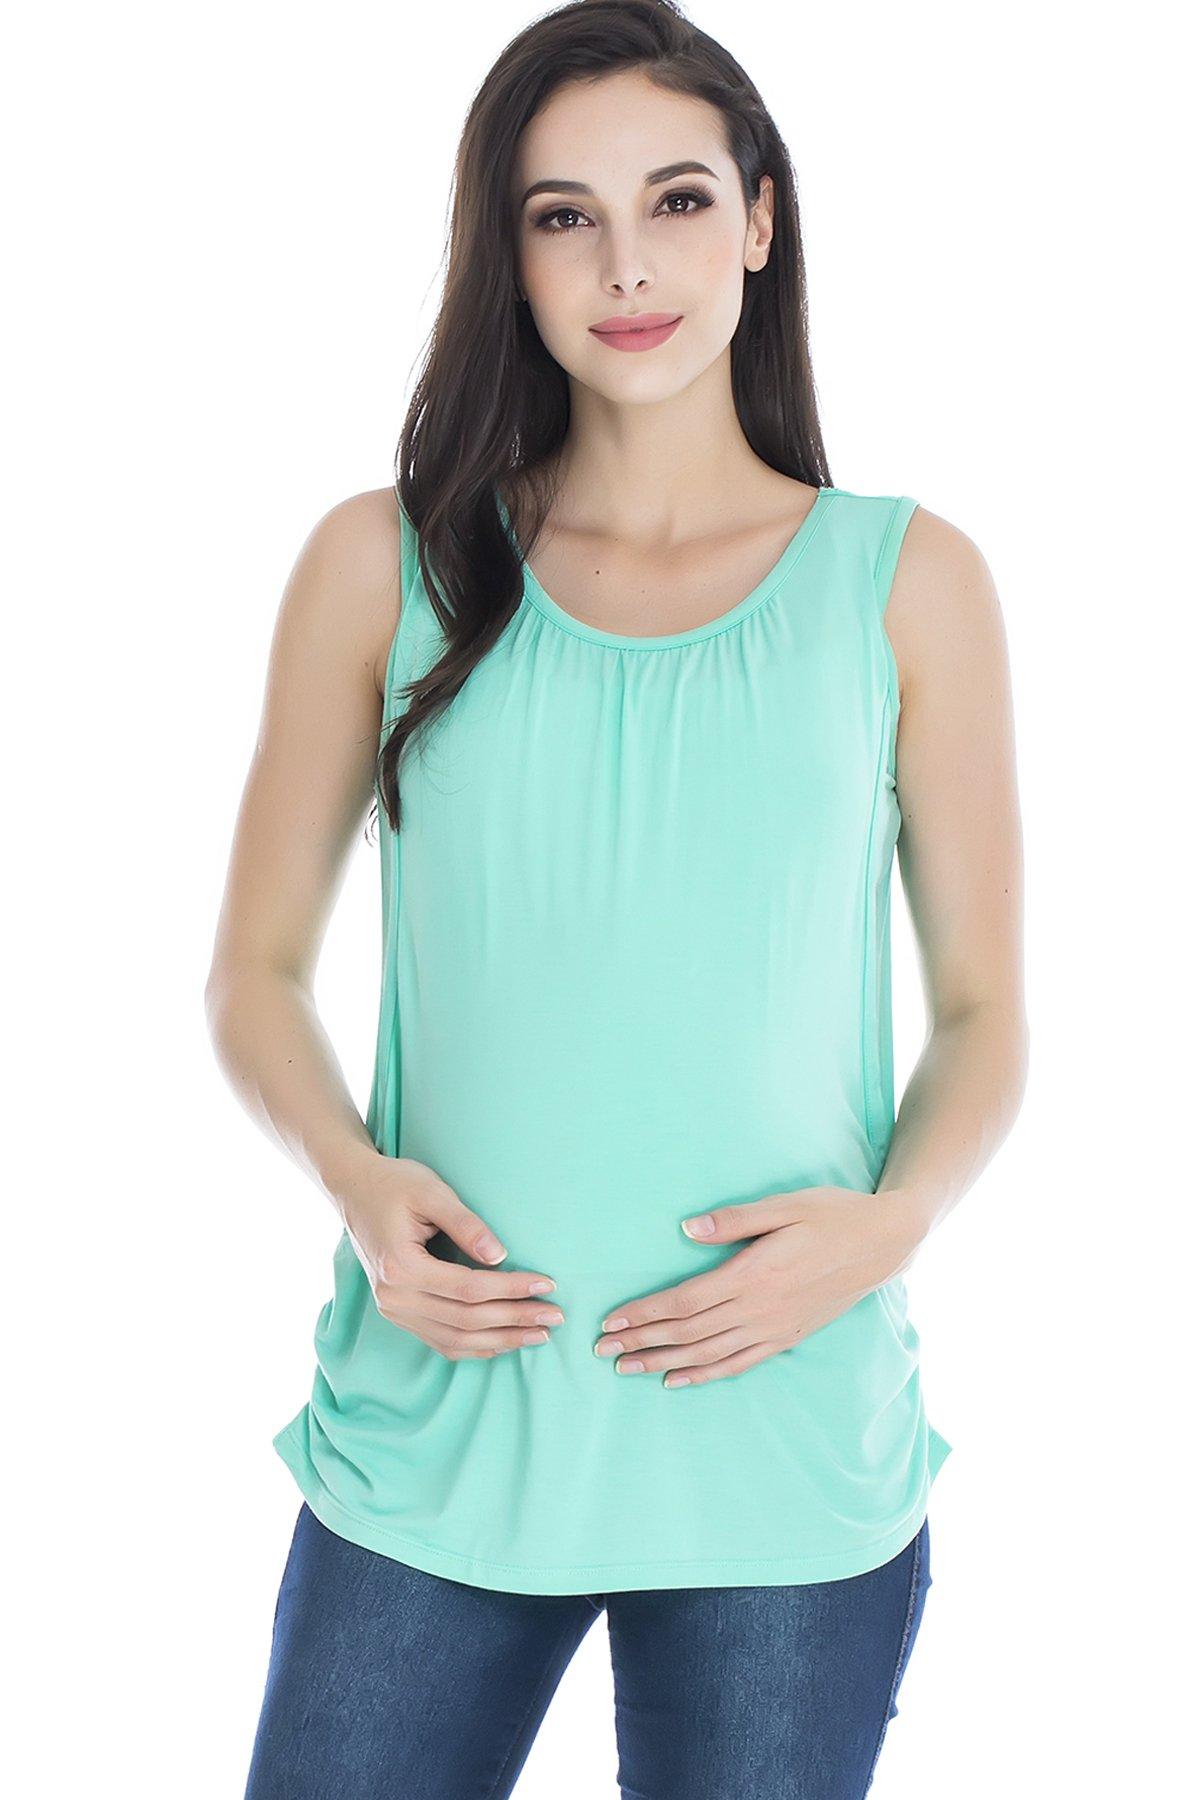 Smallshow Women's Maternity Nursing Tank Top Breastfeeding T-Shirt Green.XX-Large